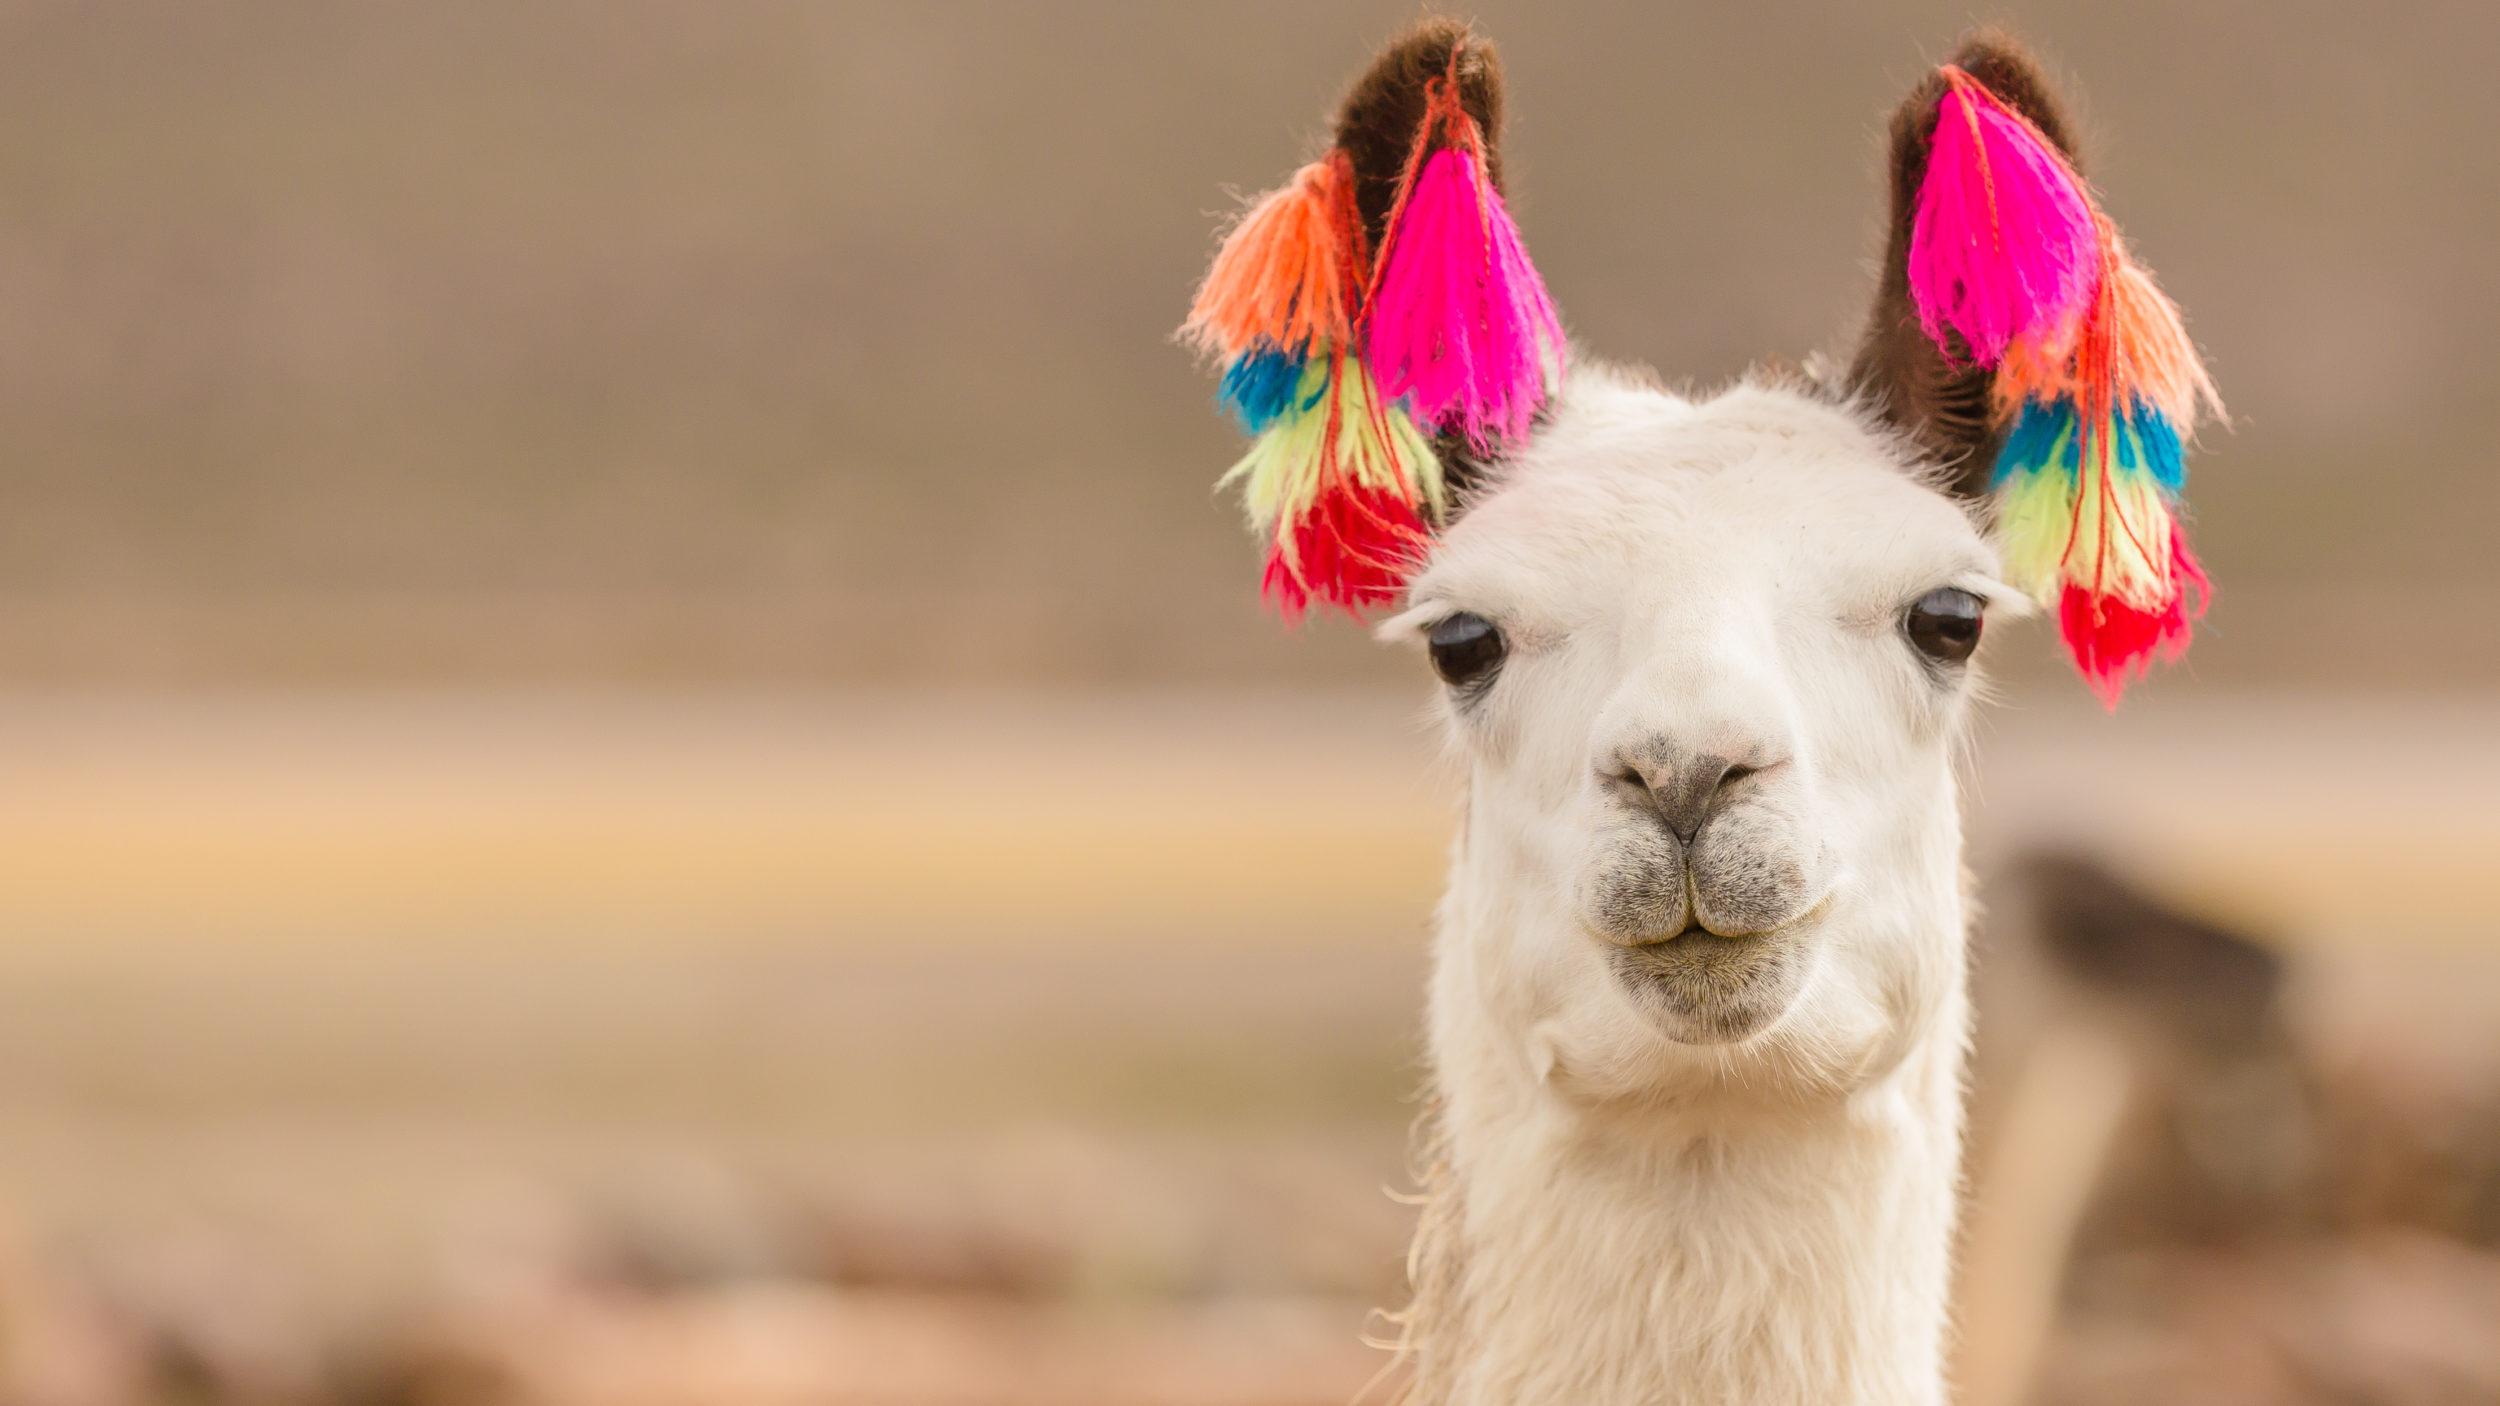 Bolivia [Shutterstock]